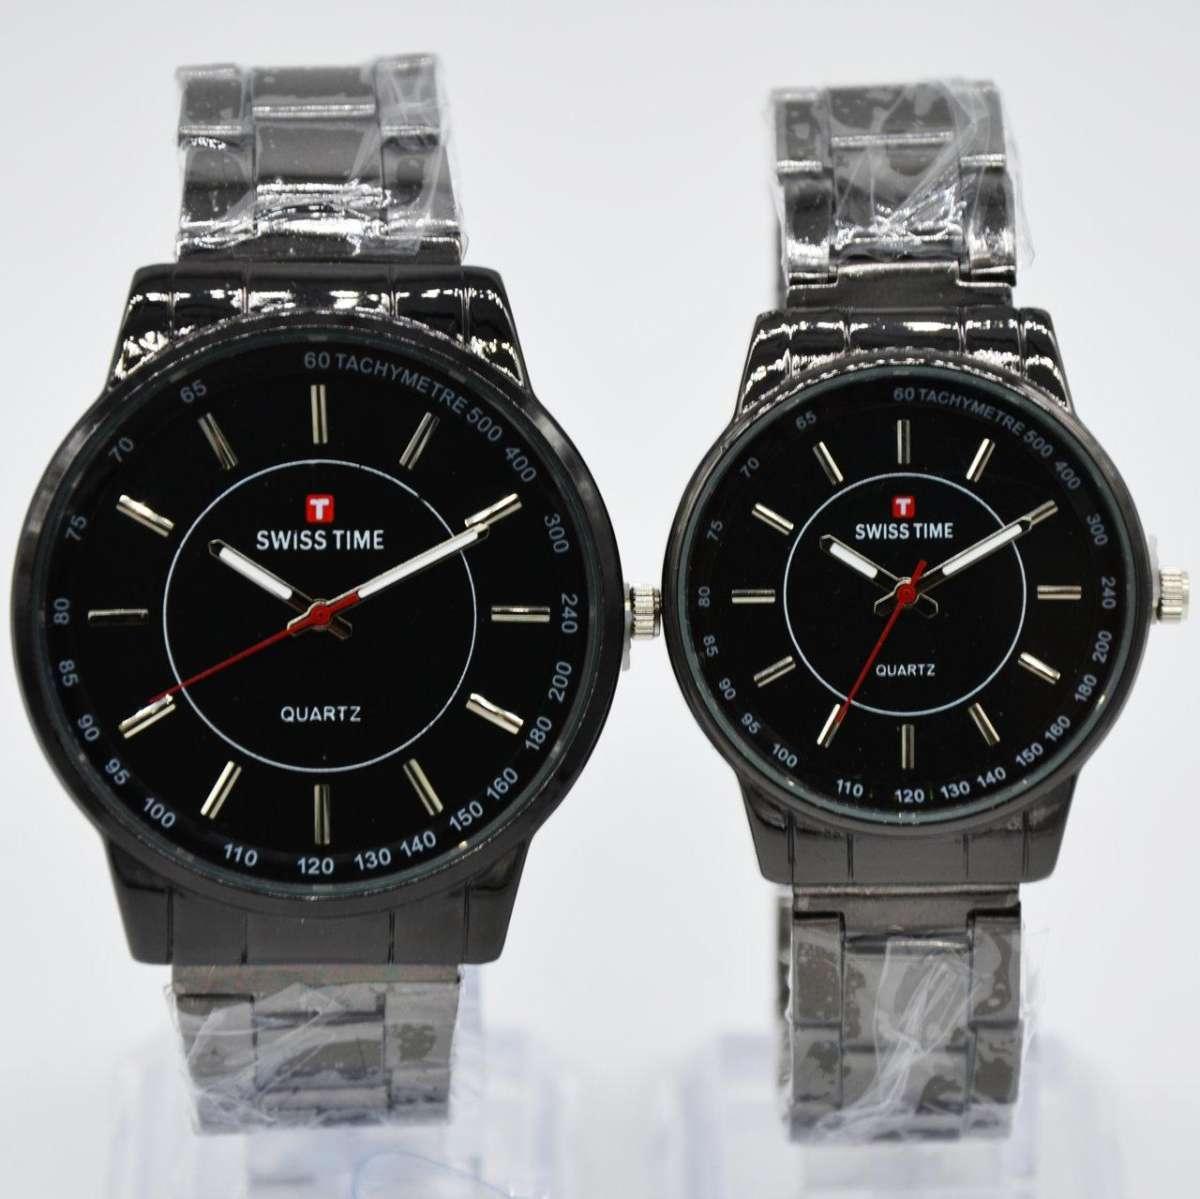 Swiss Time/Army - Jam Tangan Couple Stainless Steel - terbaru ST3887